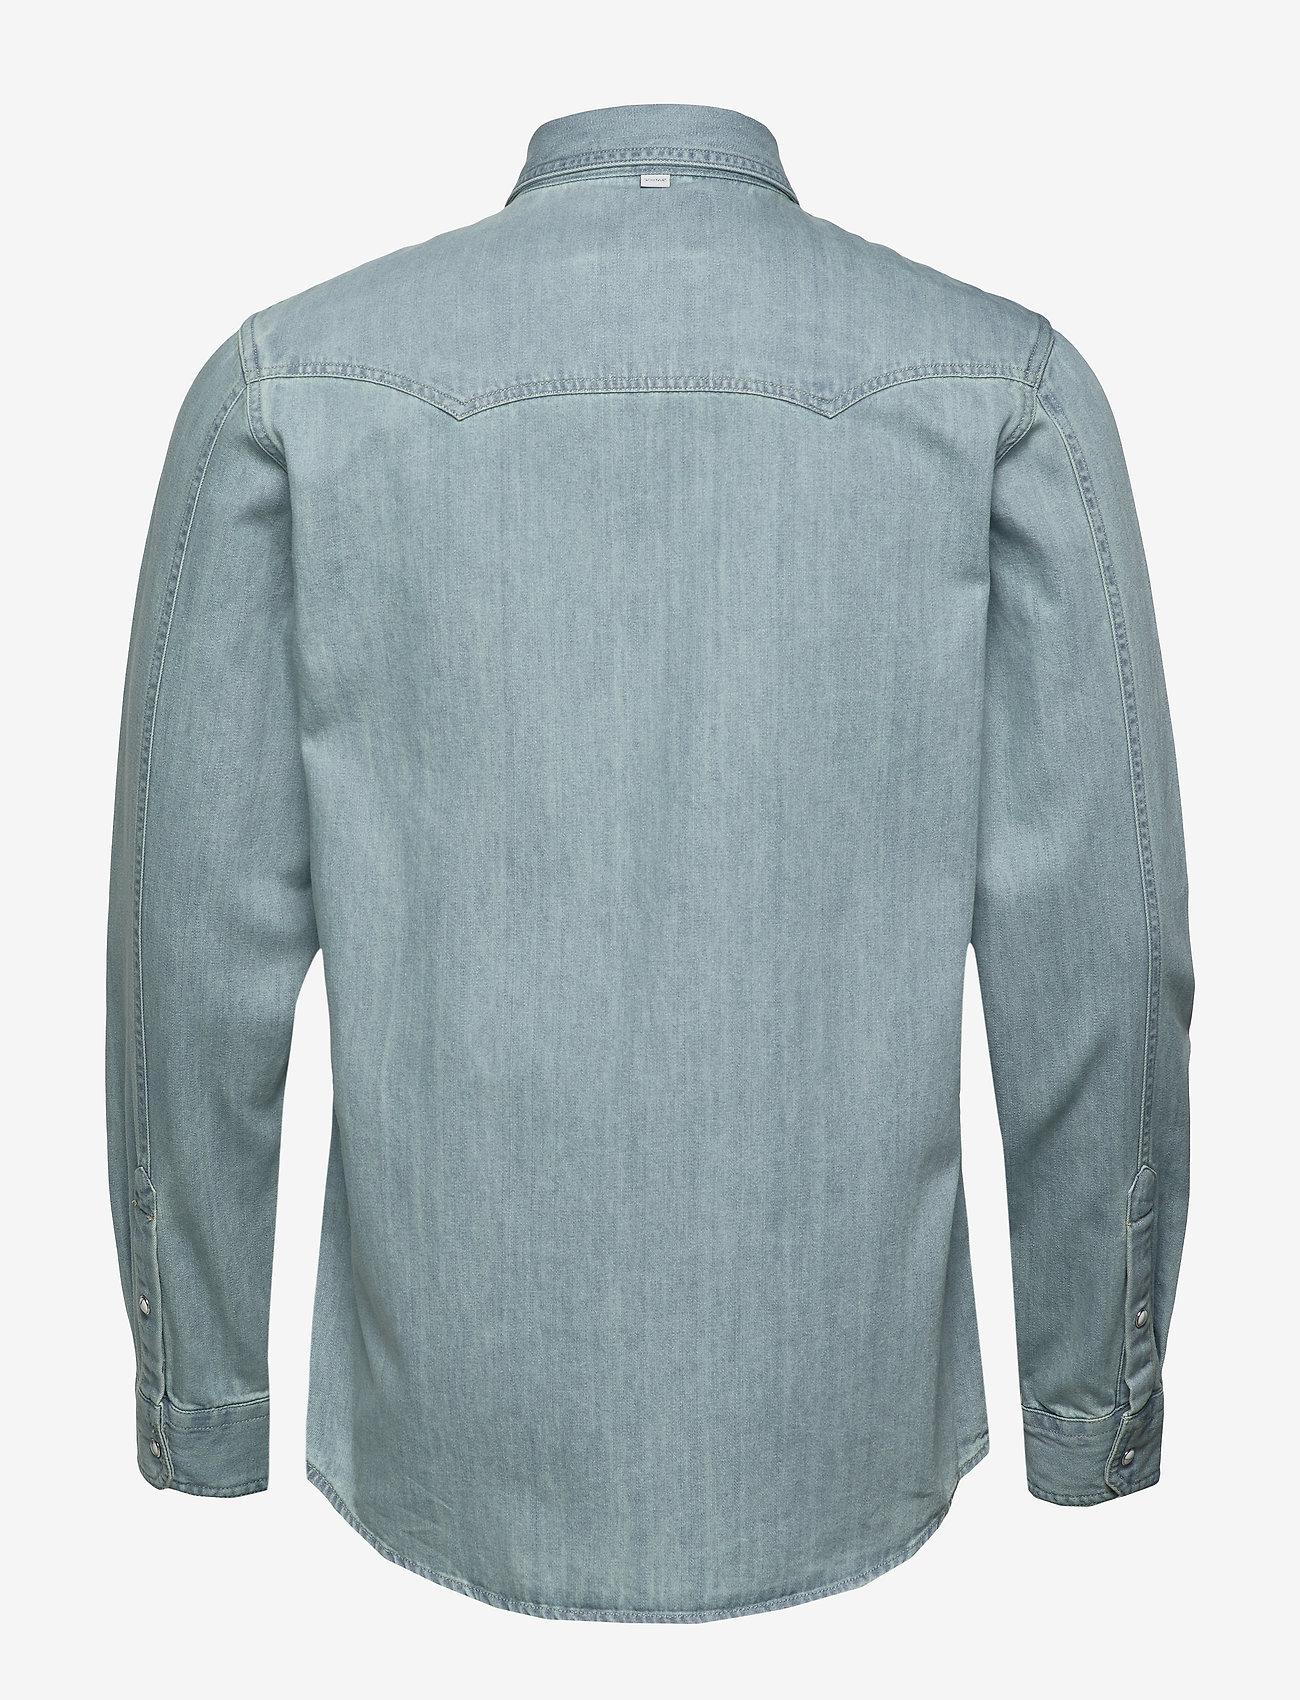 Scotch & Soda - Ams Blauw denim western shirt in seasonal washes - chemises basiques - bleached indigo - 1